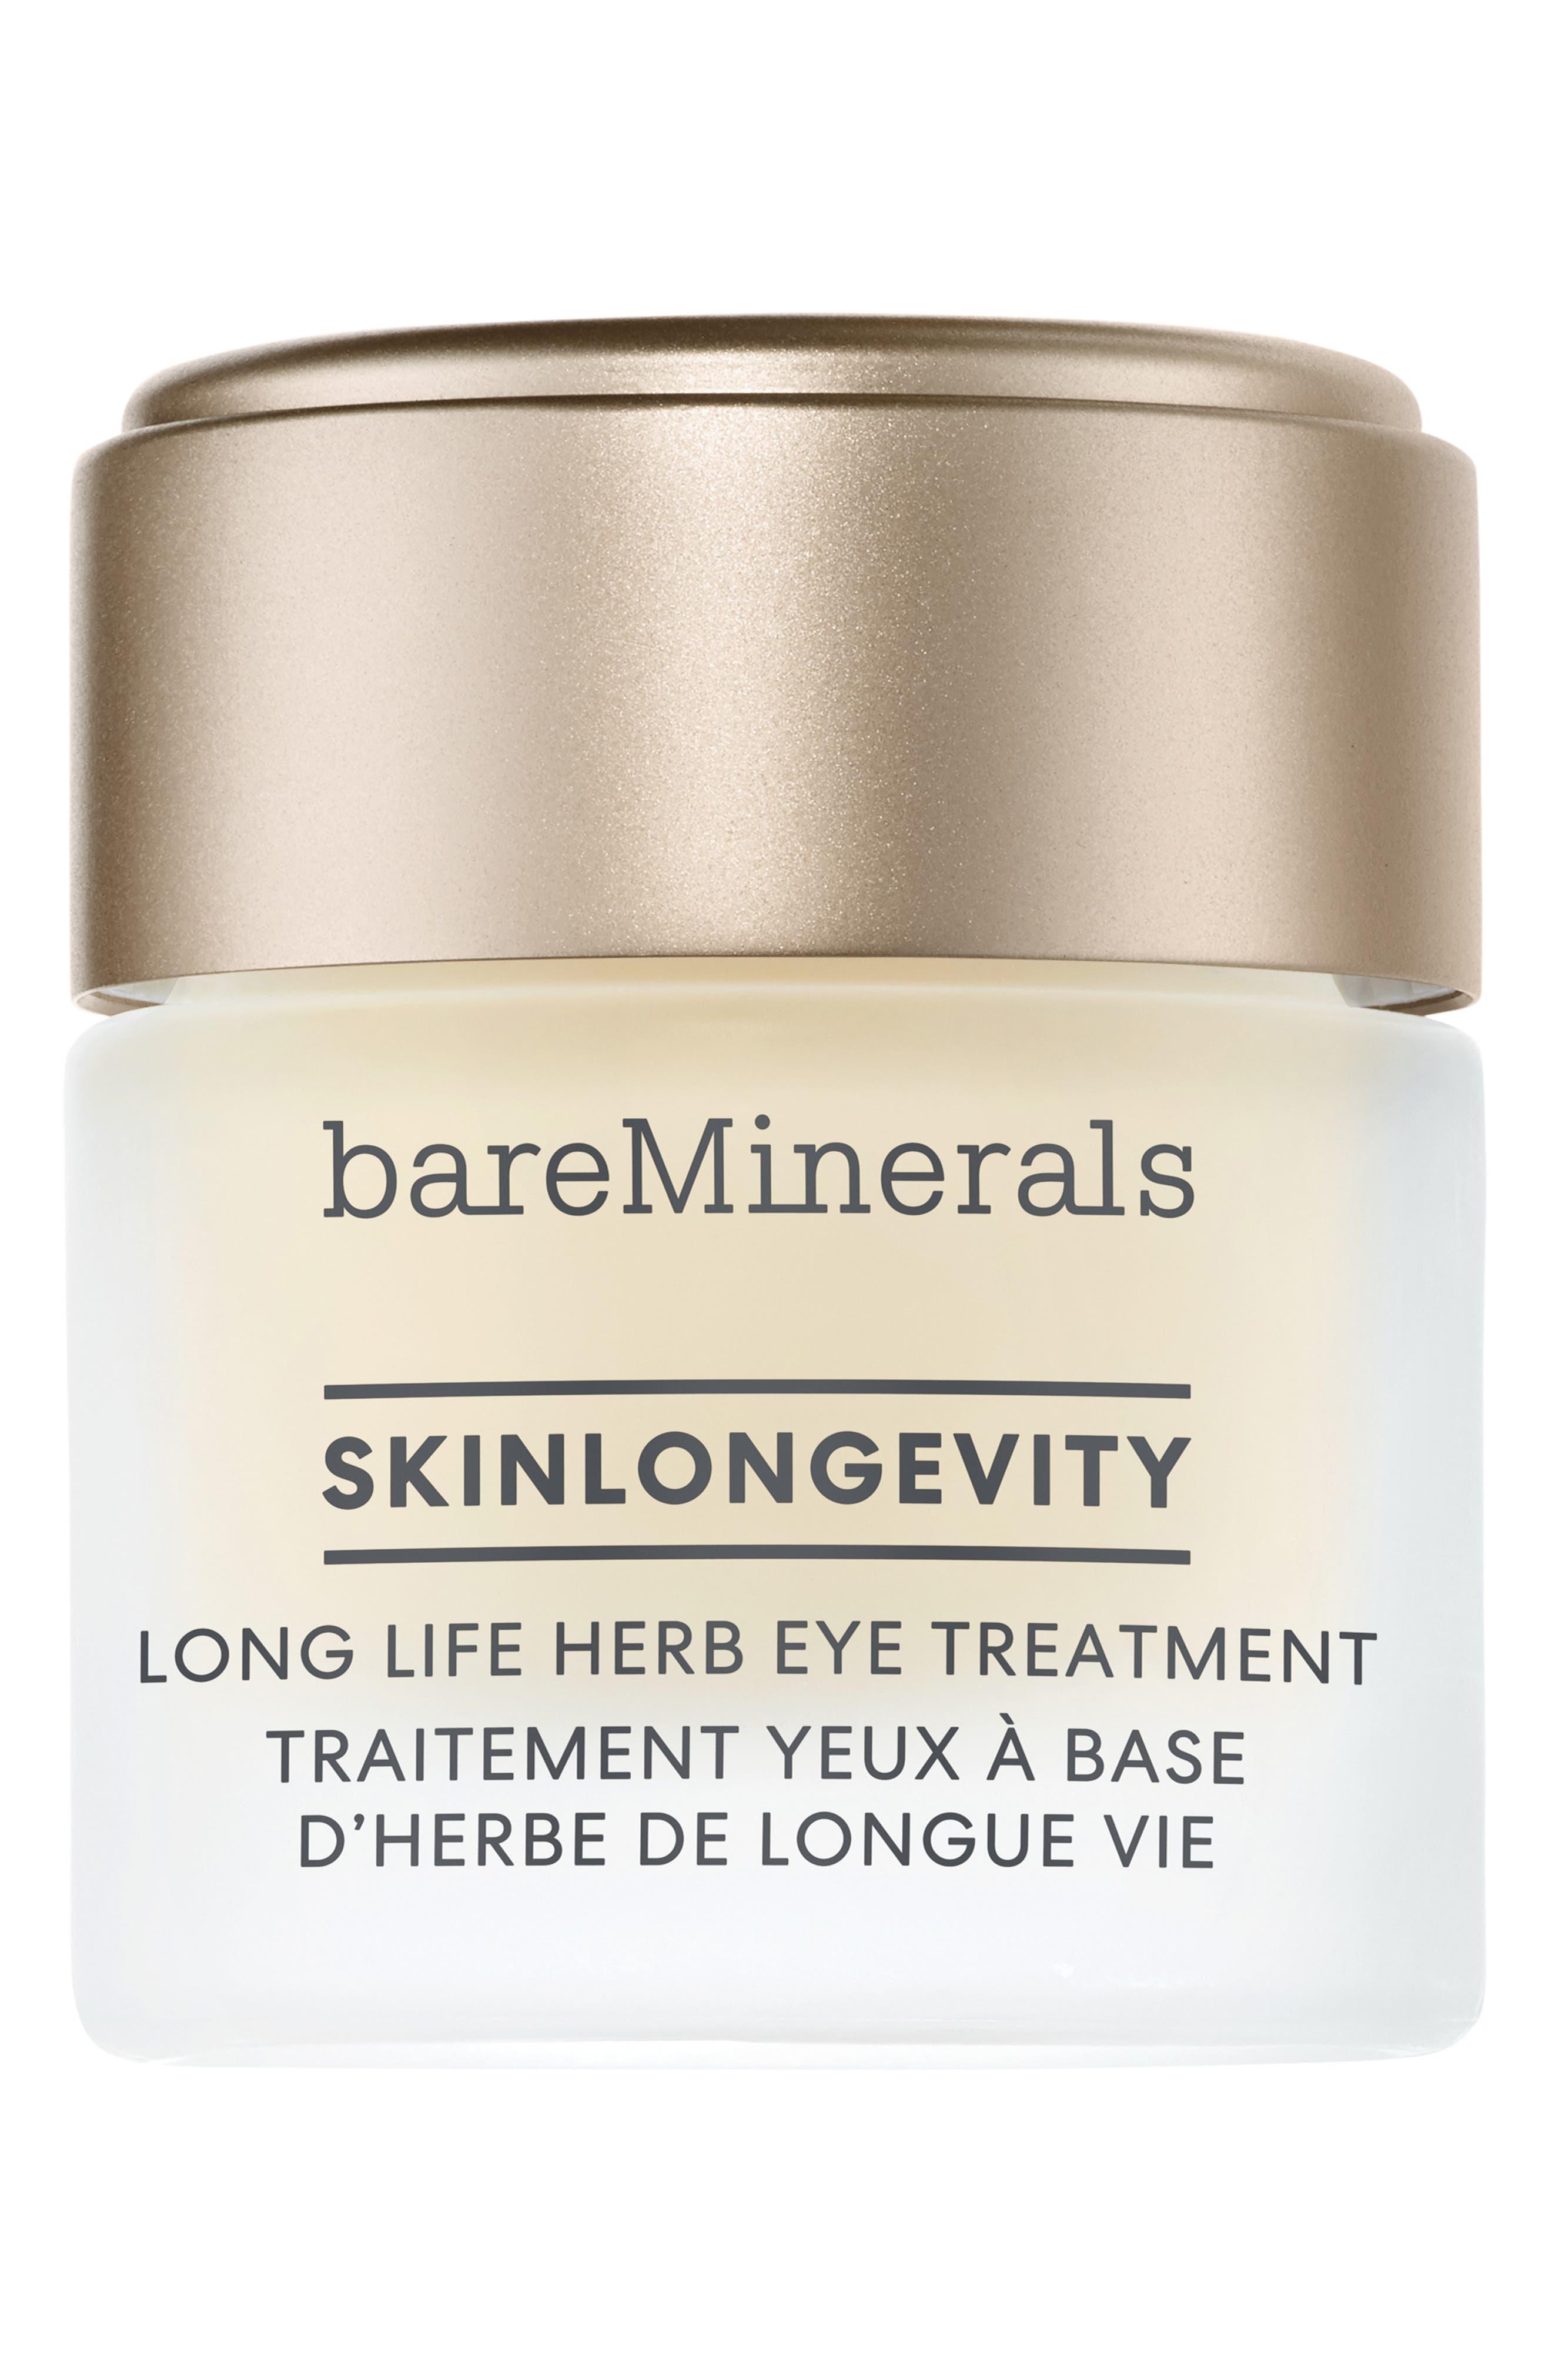 Bareminerals Skinlongevity Long Life Herb Anti-Aging Eye Treatment